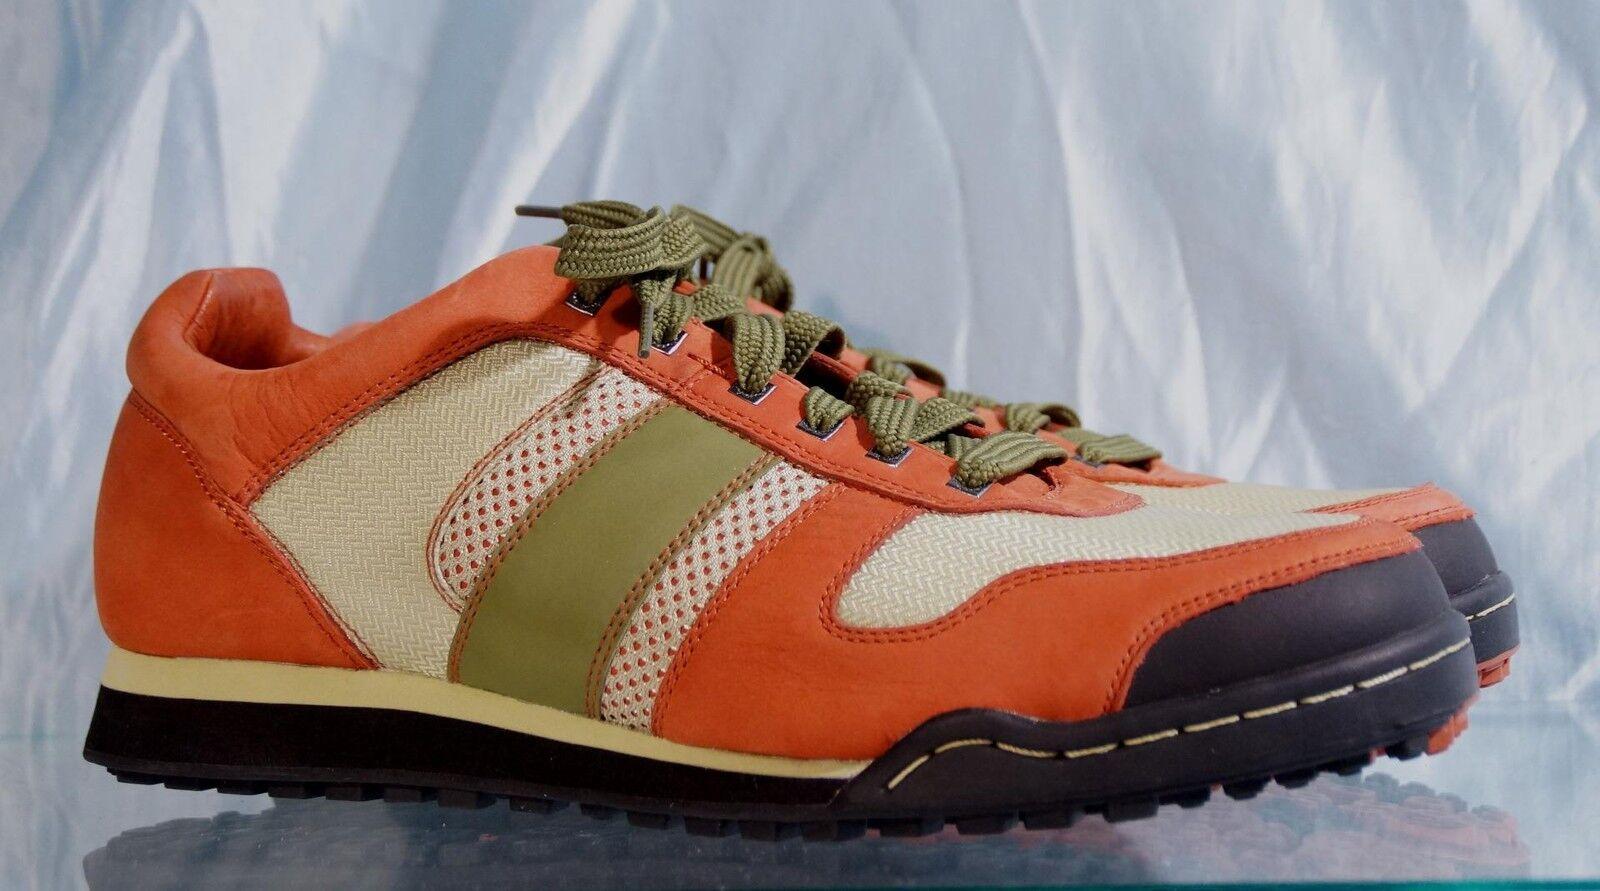 New No Box orange & Green JHUNG YURO Low Top Hikers Sz 13